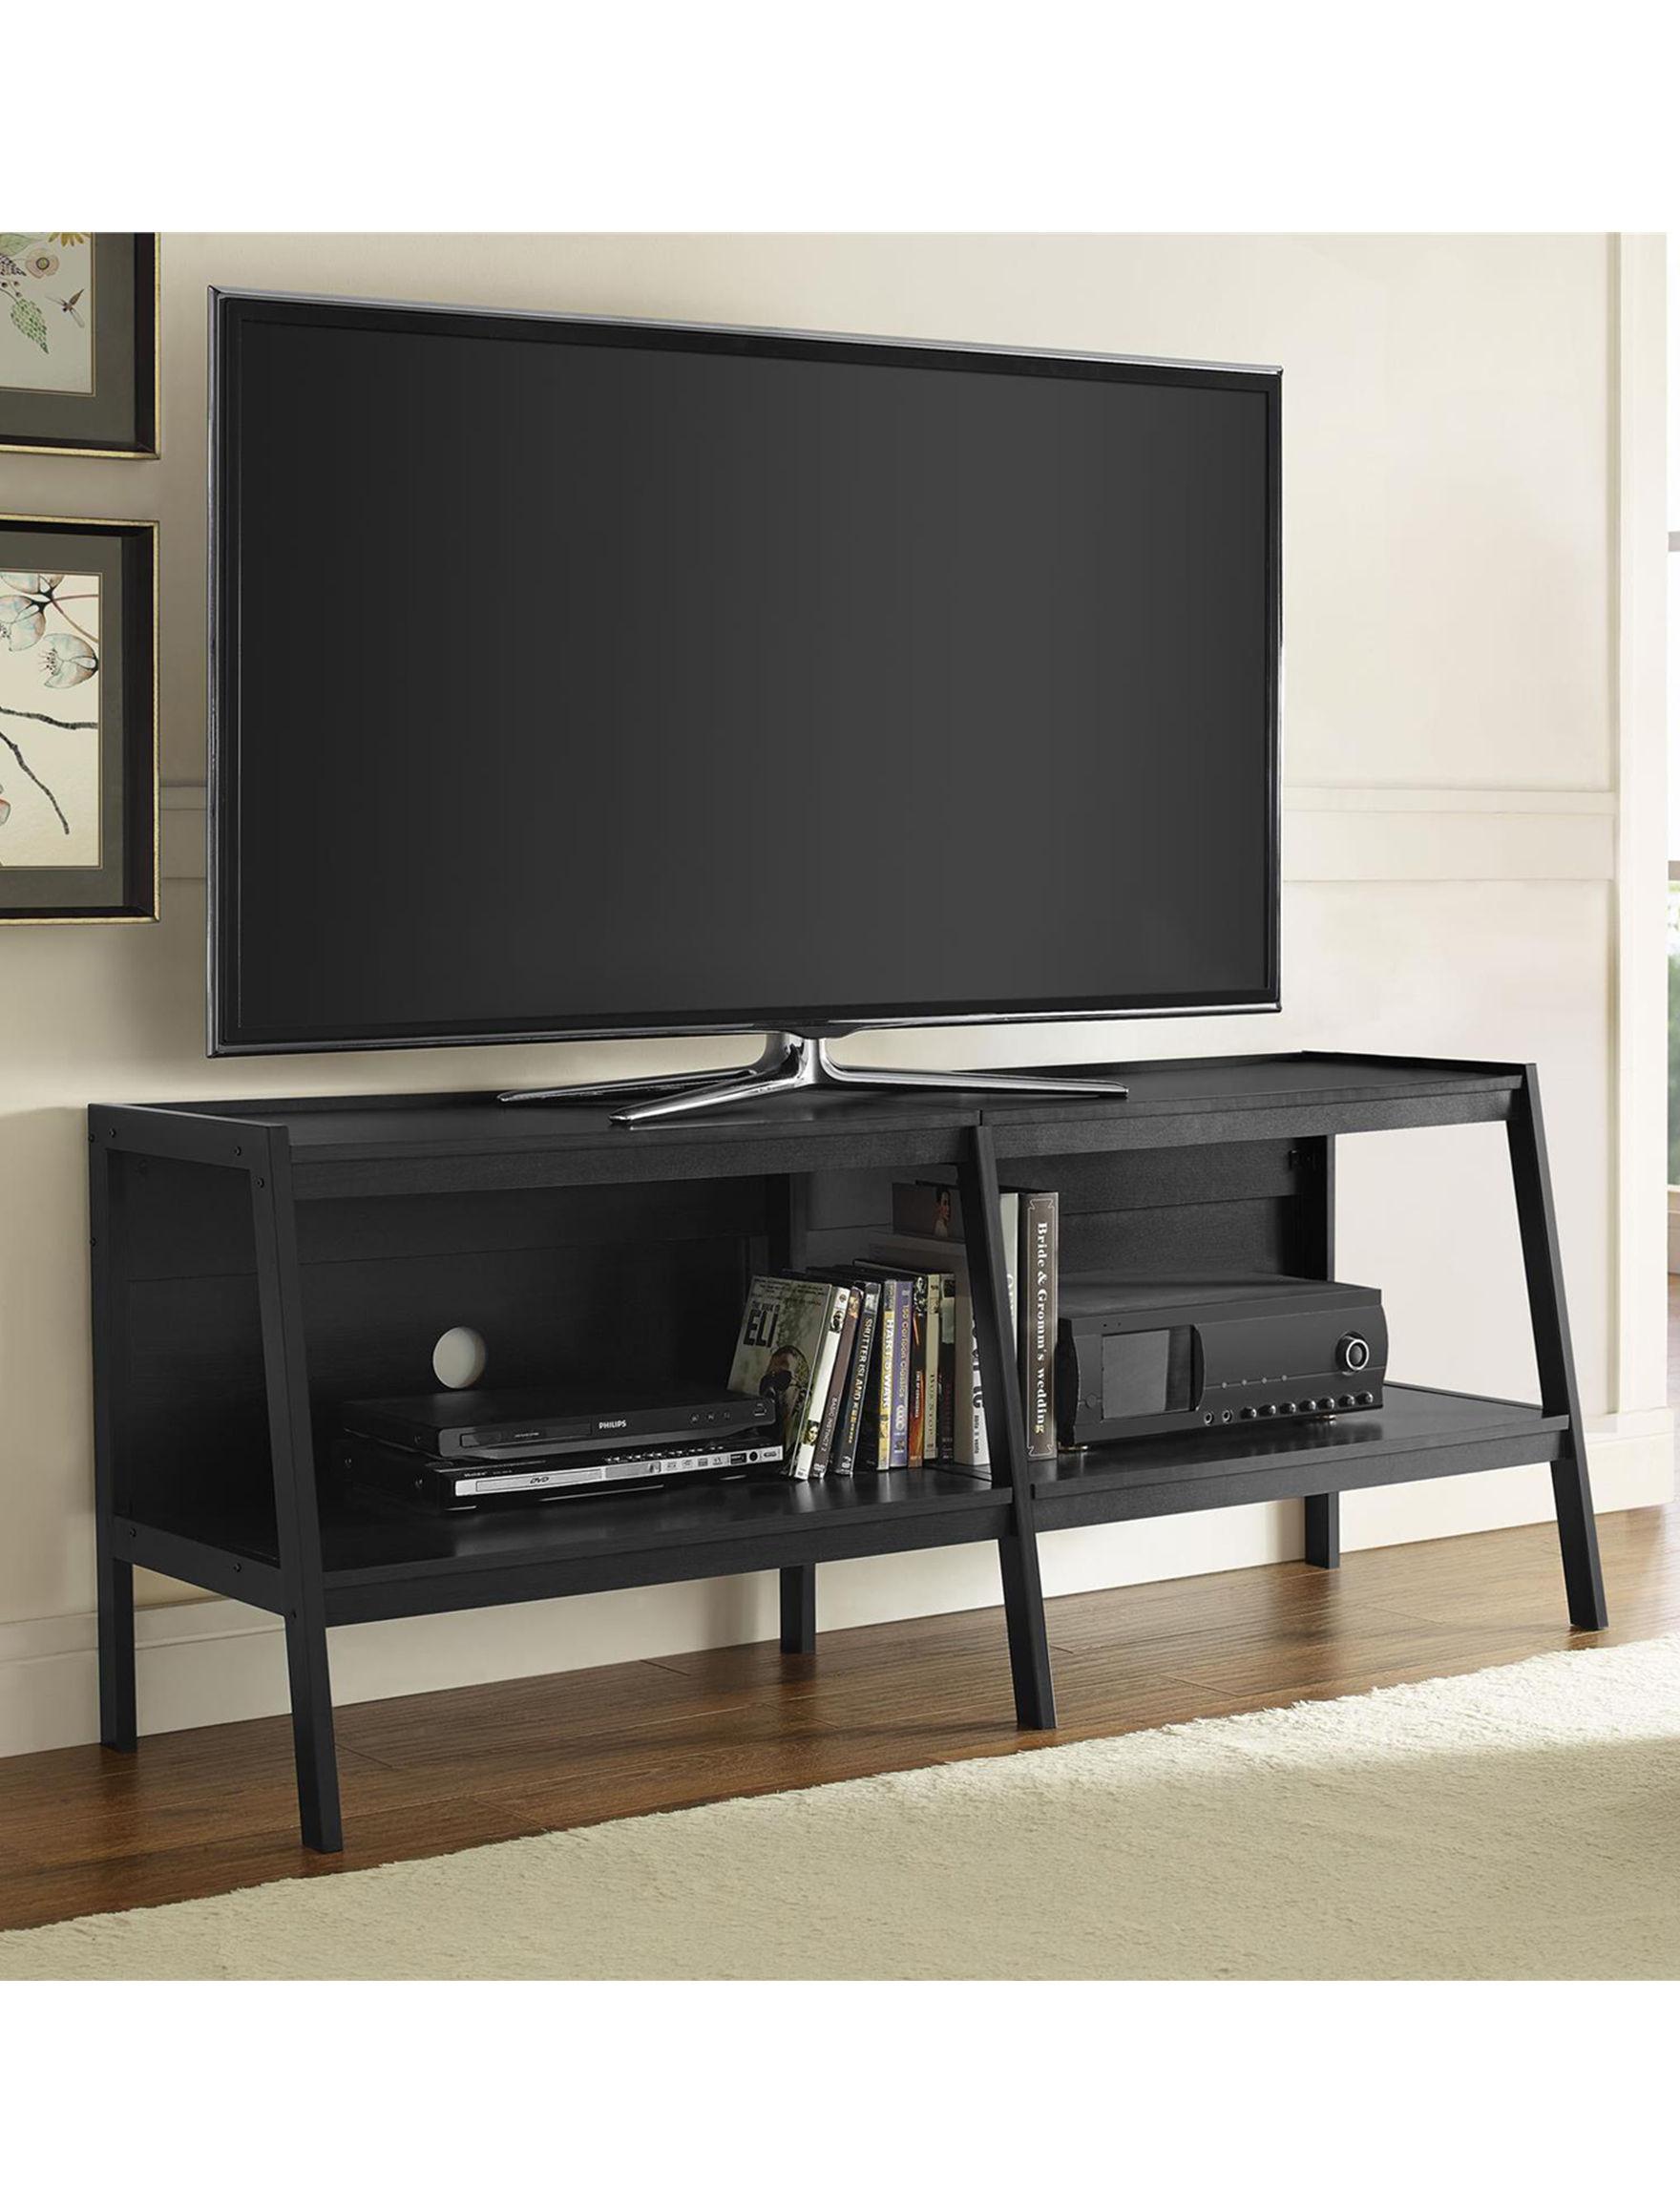 Ameriwood Black TV Stands & Entertainment Centers Living Room Furniture